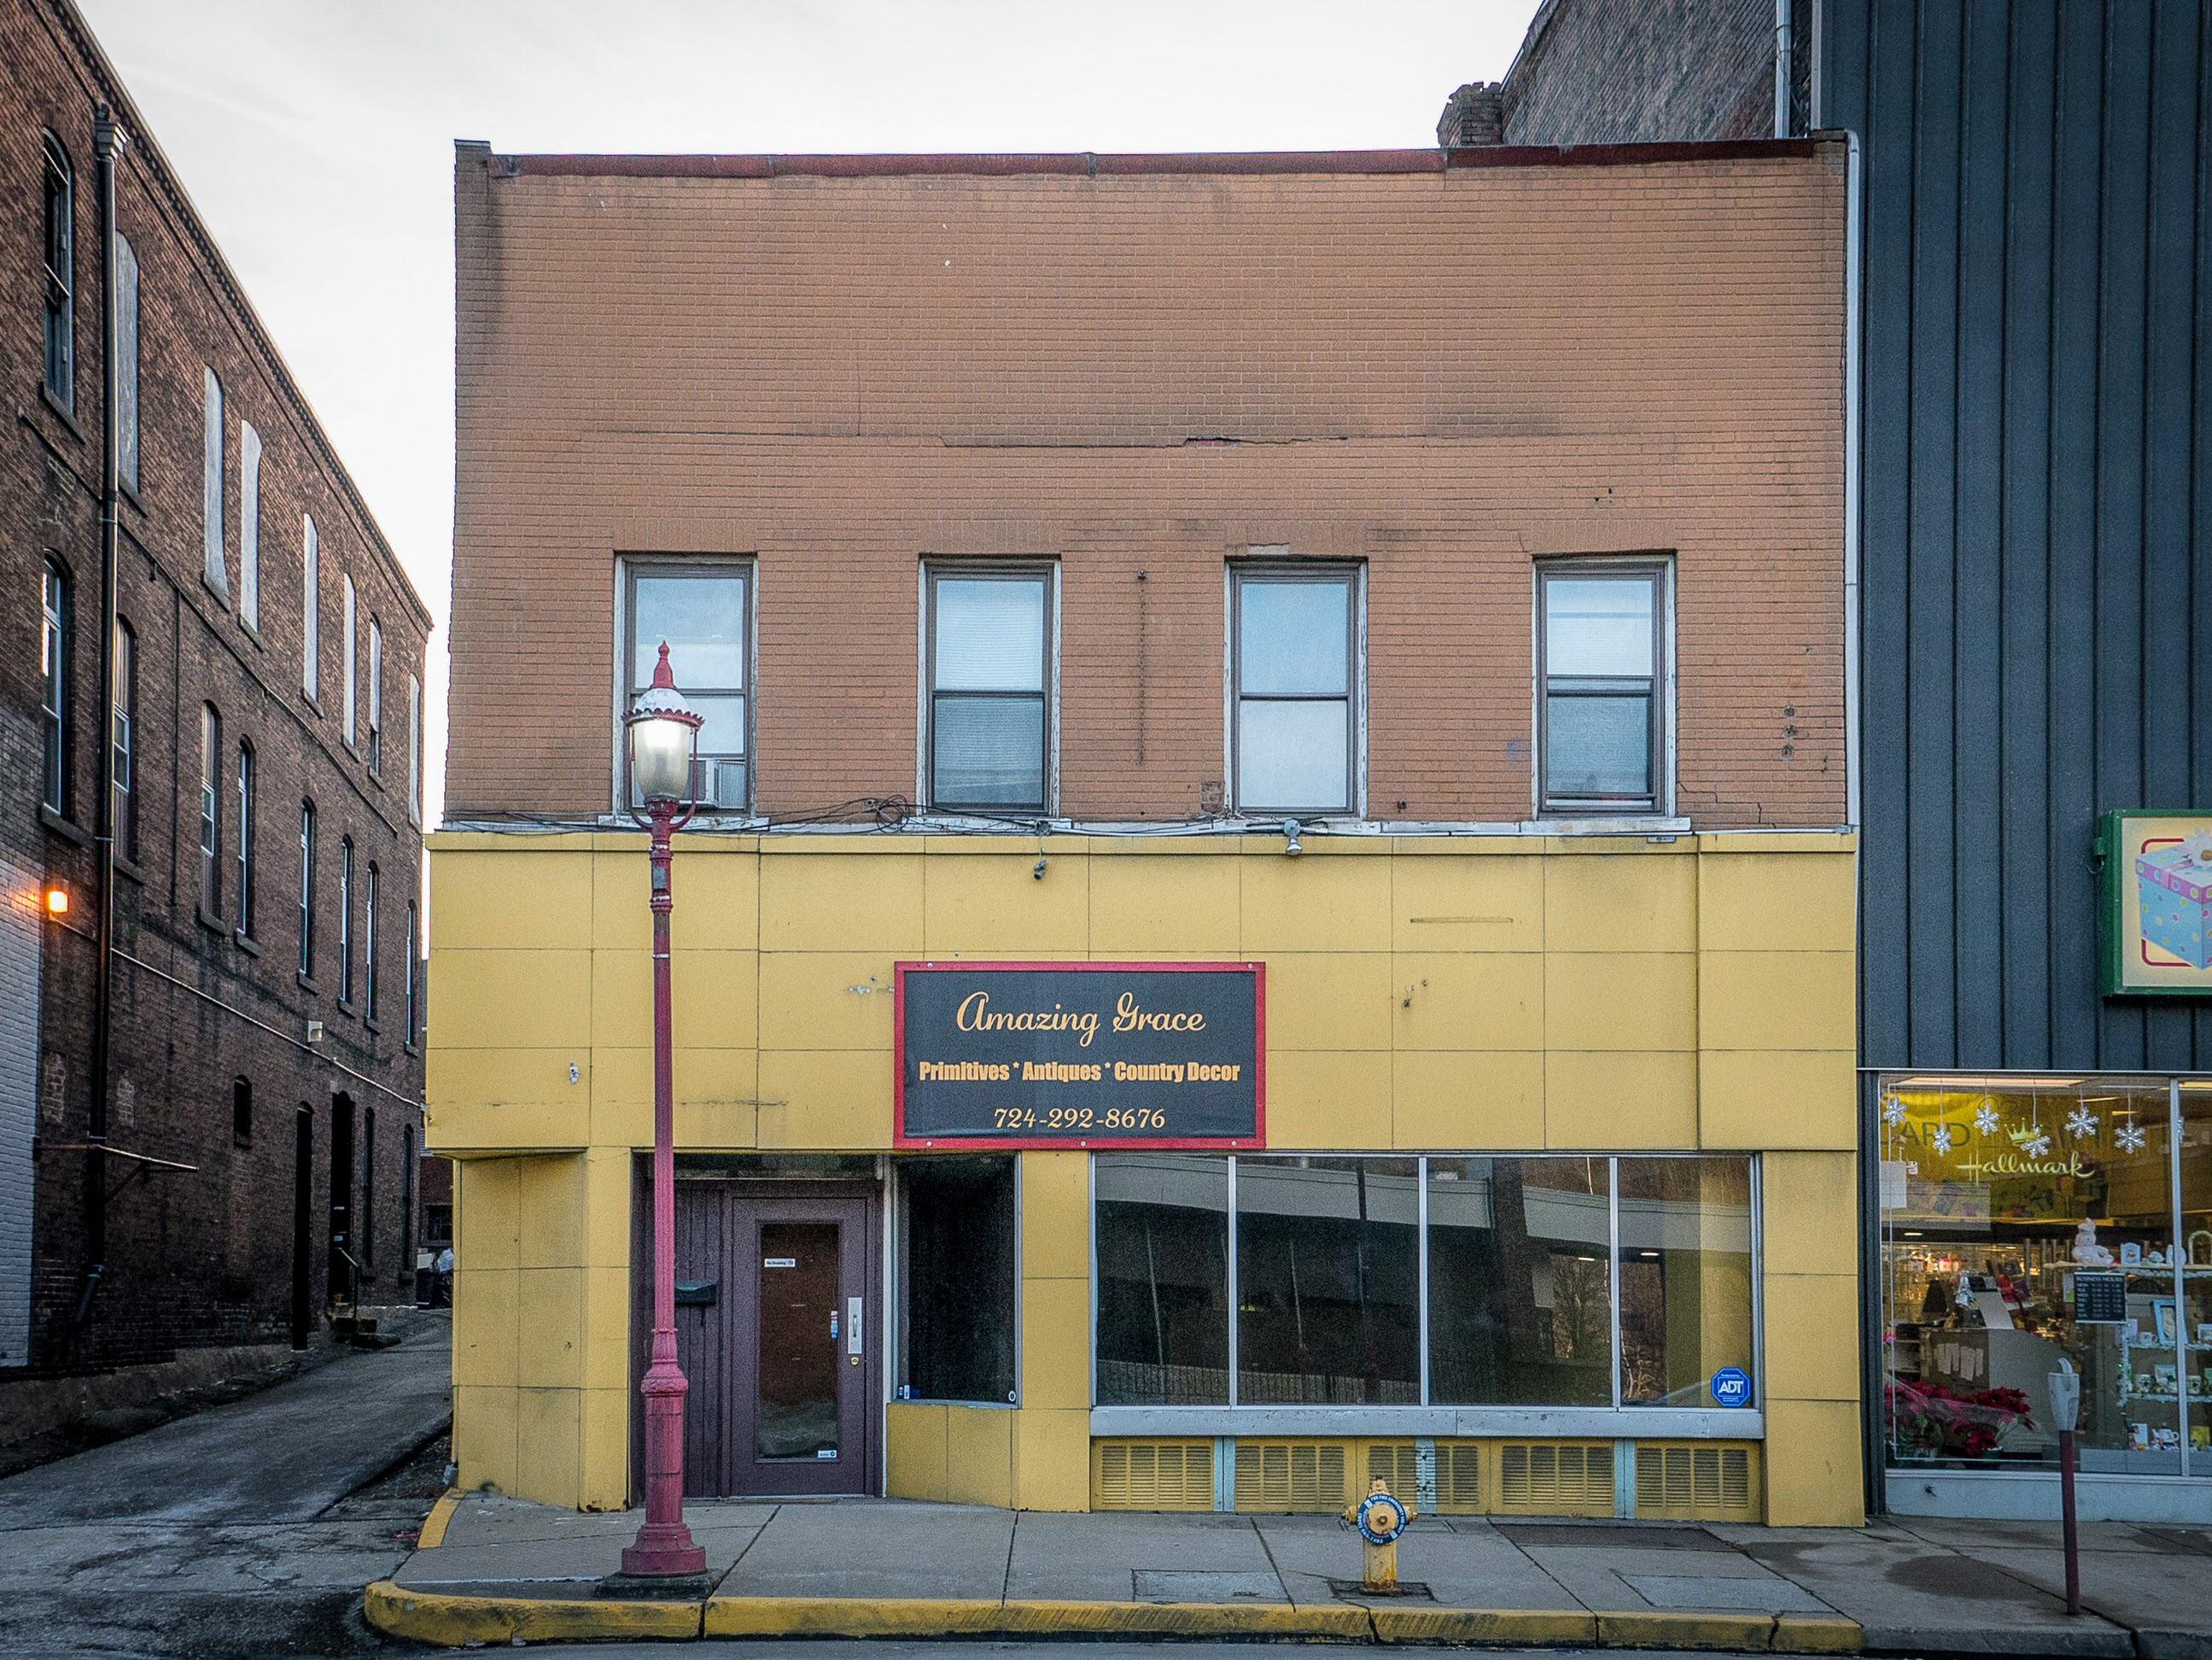 Photo of building at 234 West Main Street, Monongahela, Pa. 15063 along rt 88 and rt 136. Photo property of the Monongahela Main Street Program.